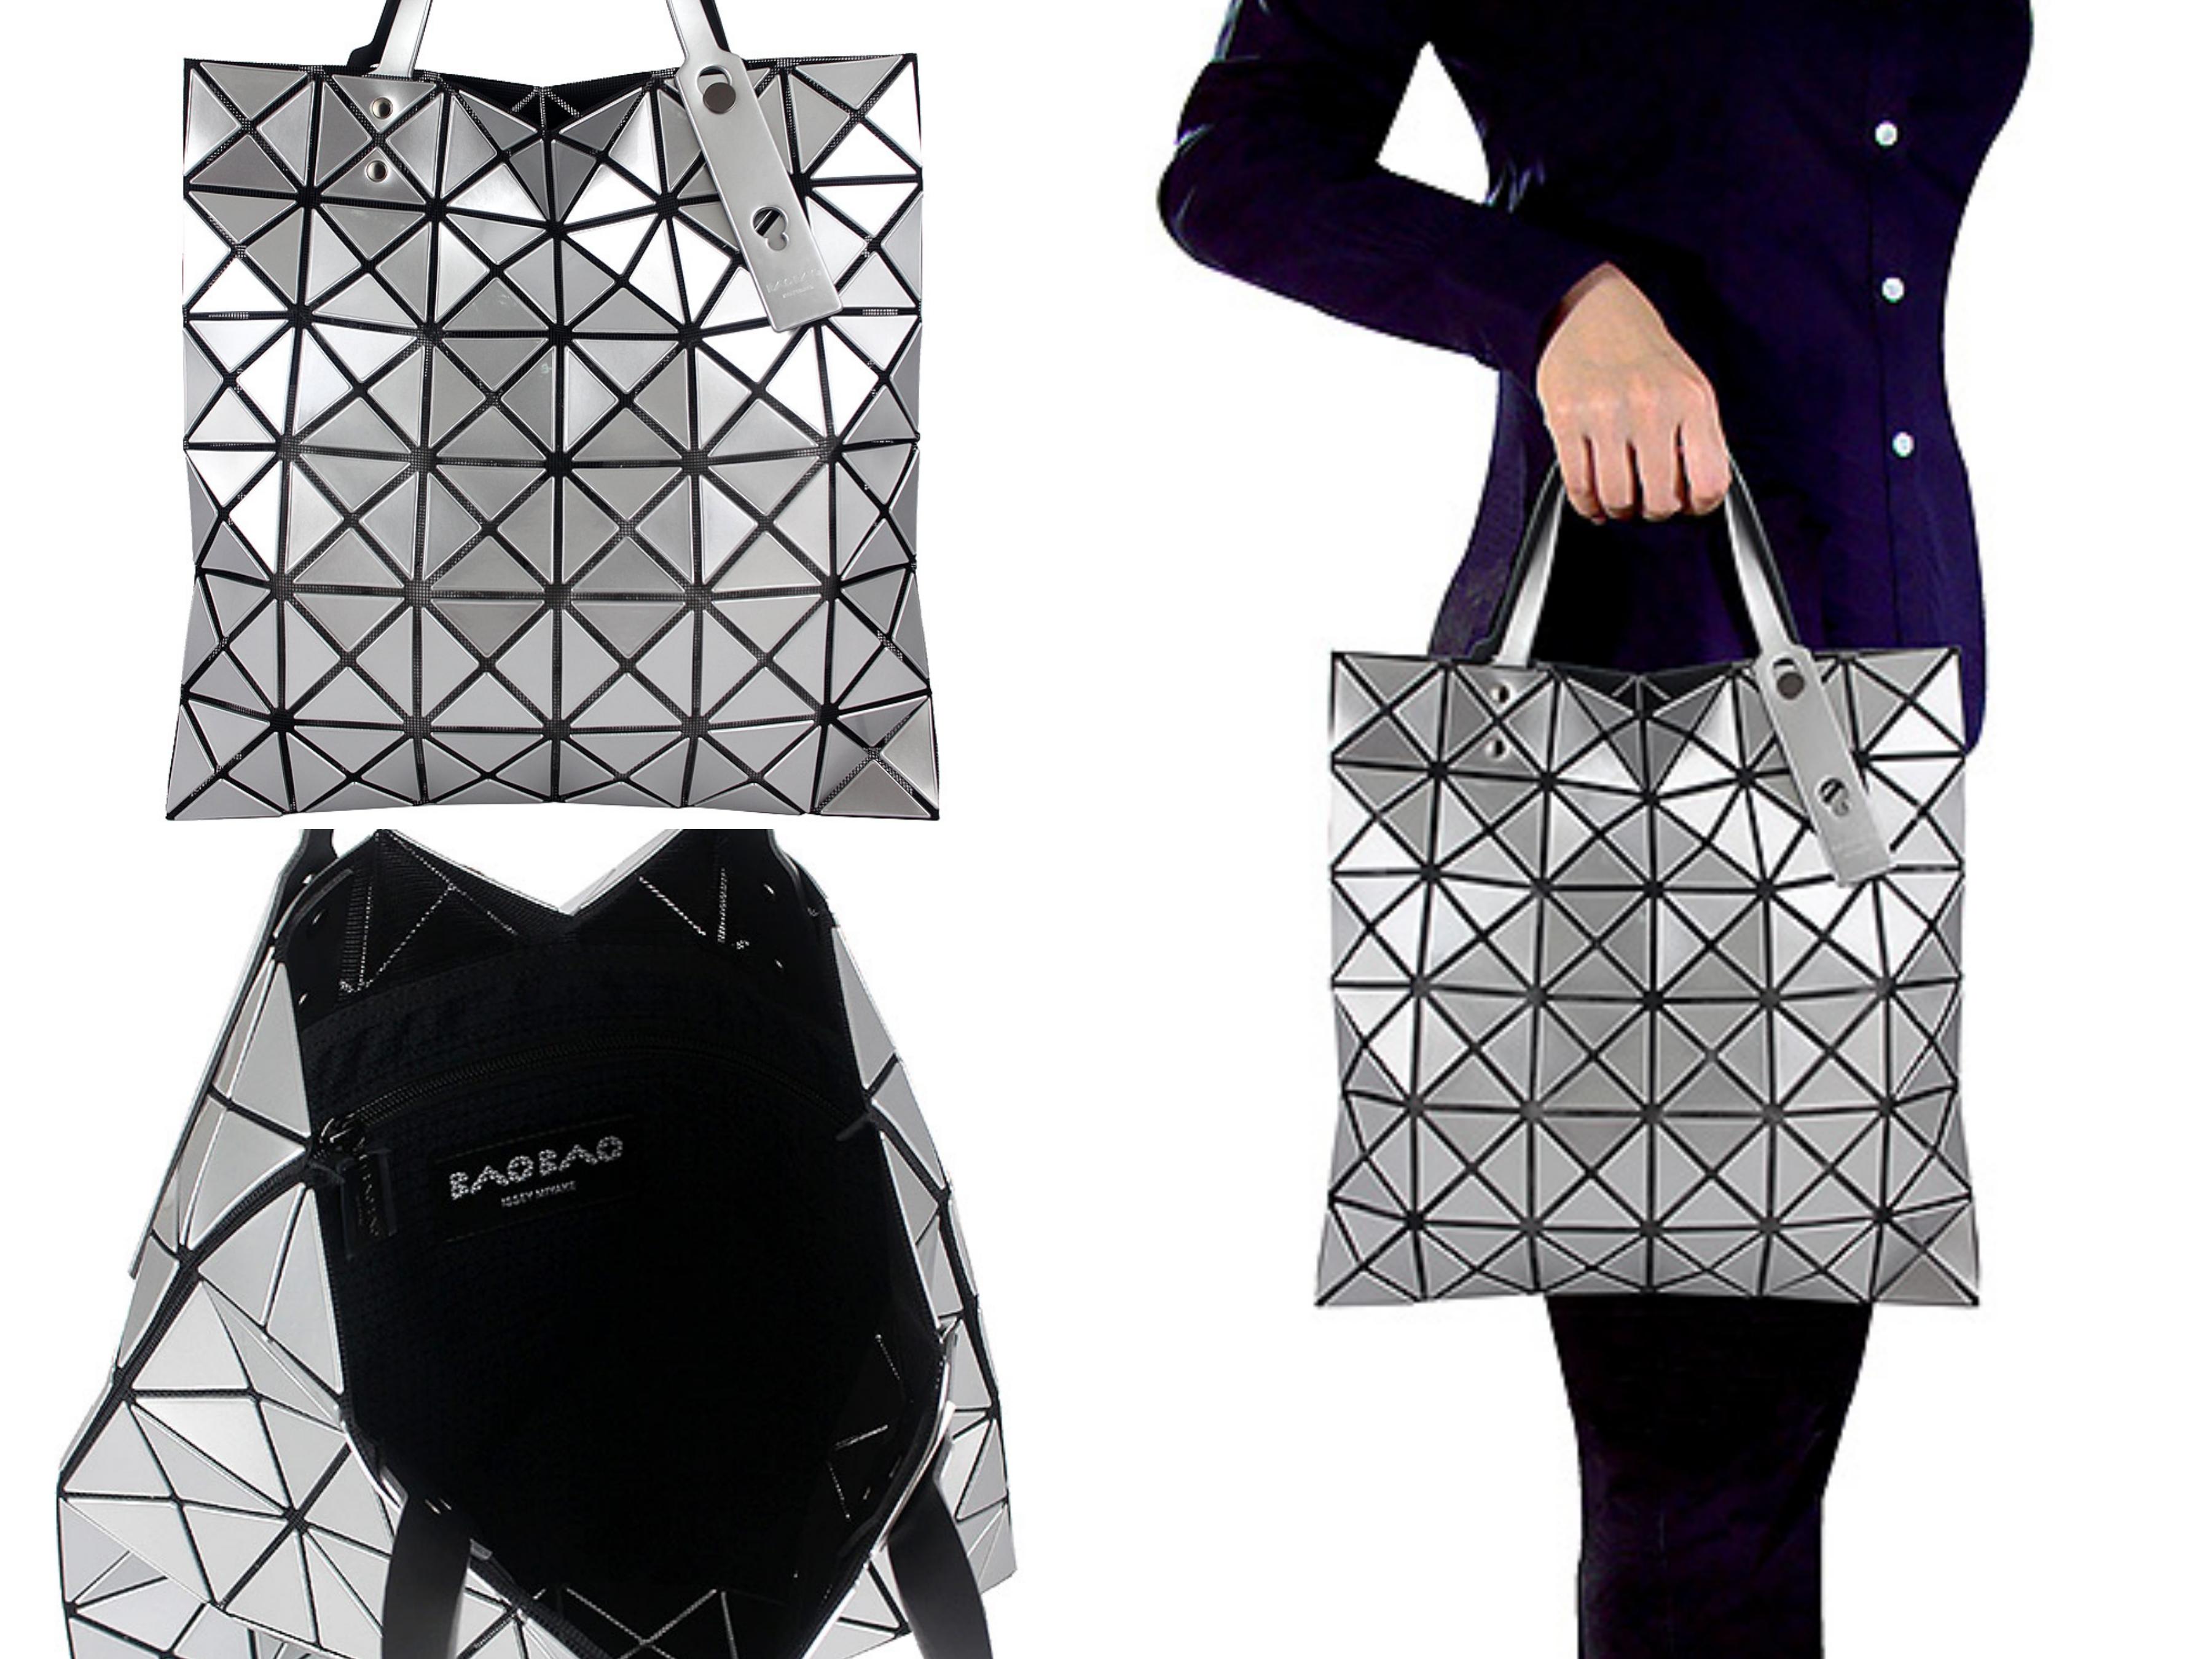 ISSEY MIYAKE 三宅一生話題度最高的BAOBAO包,經典幾何圖形方格設計系列